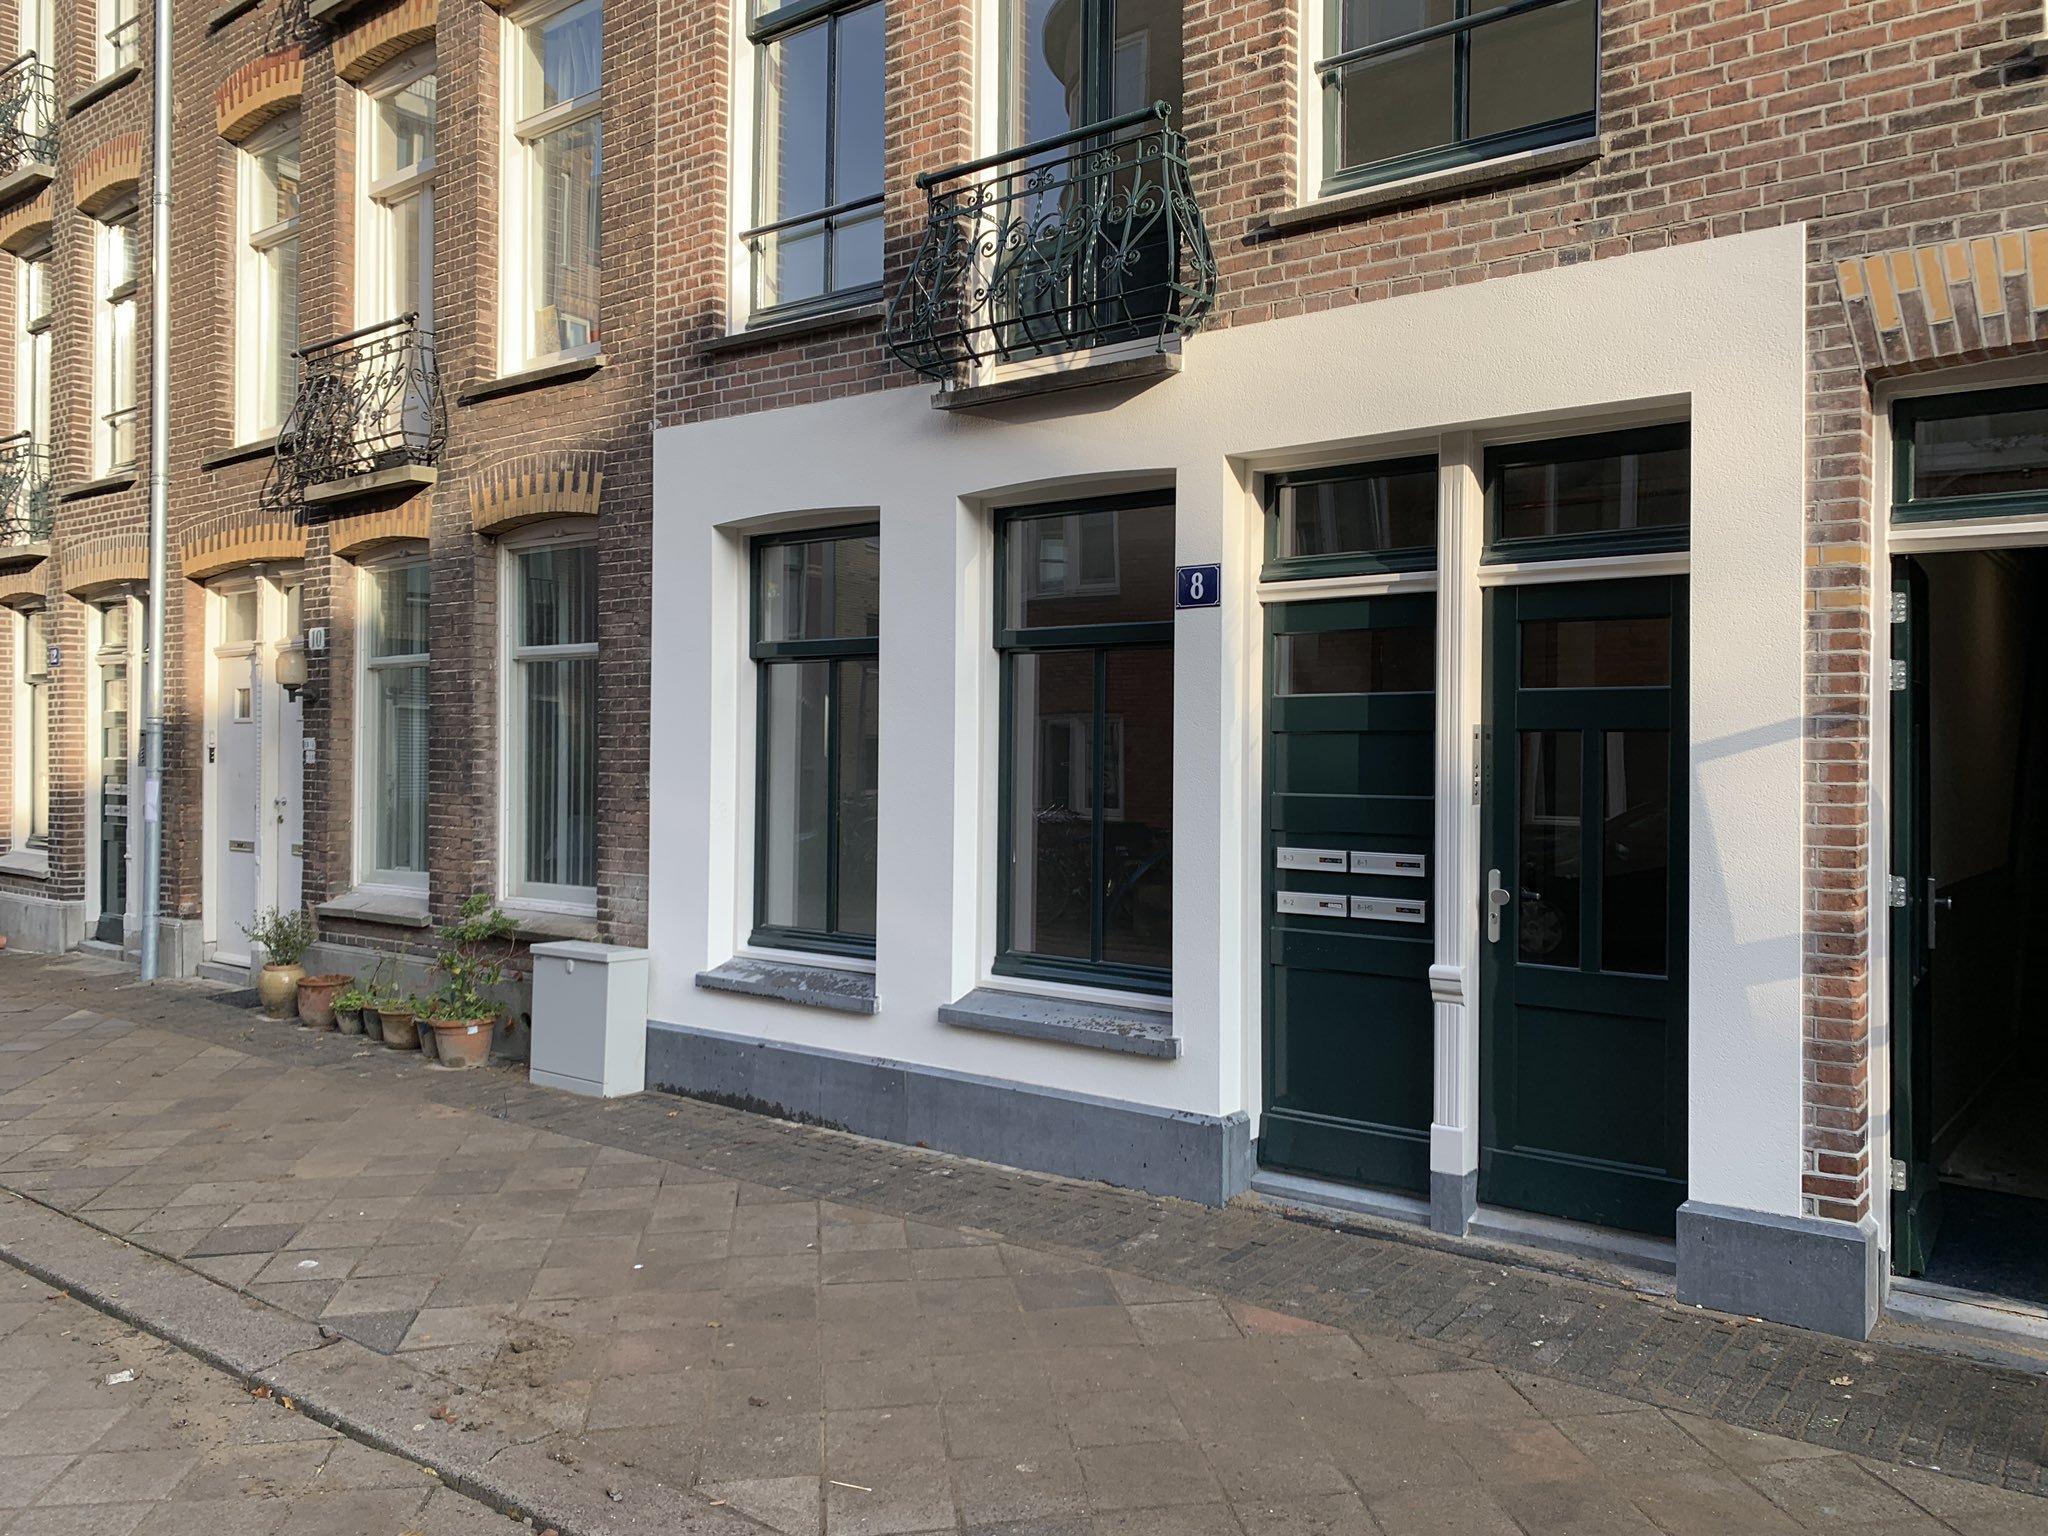 Simon Stevinstraat Renovatie Amsterdam